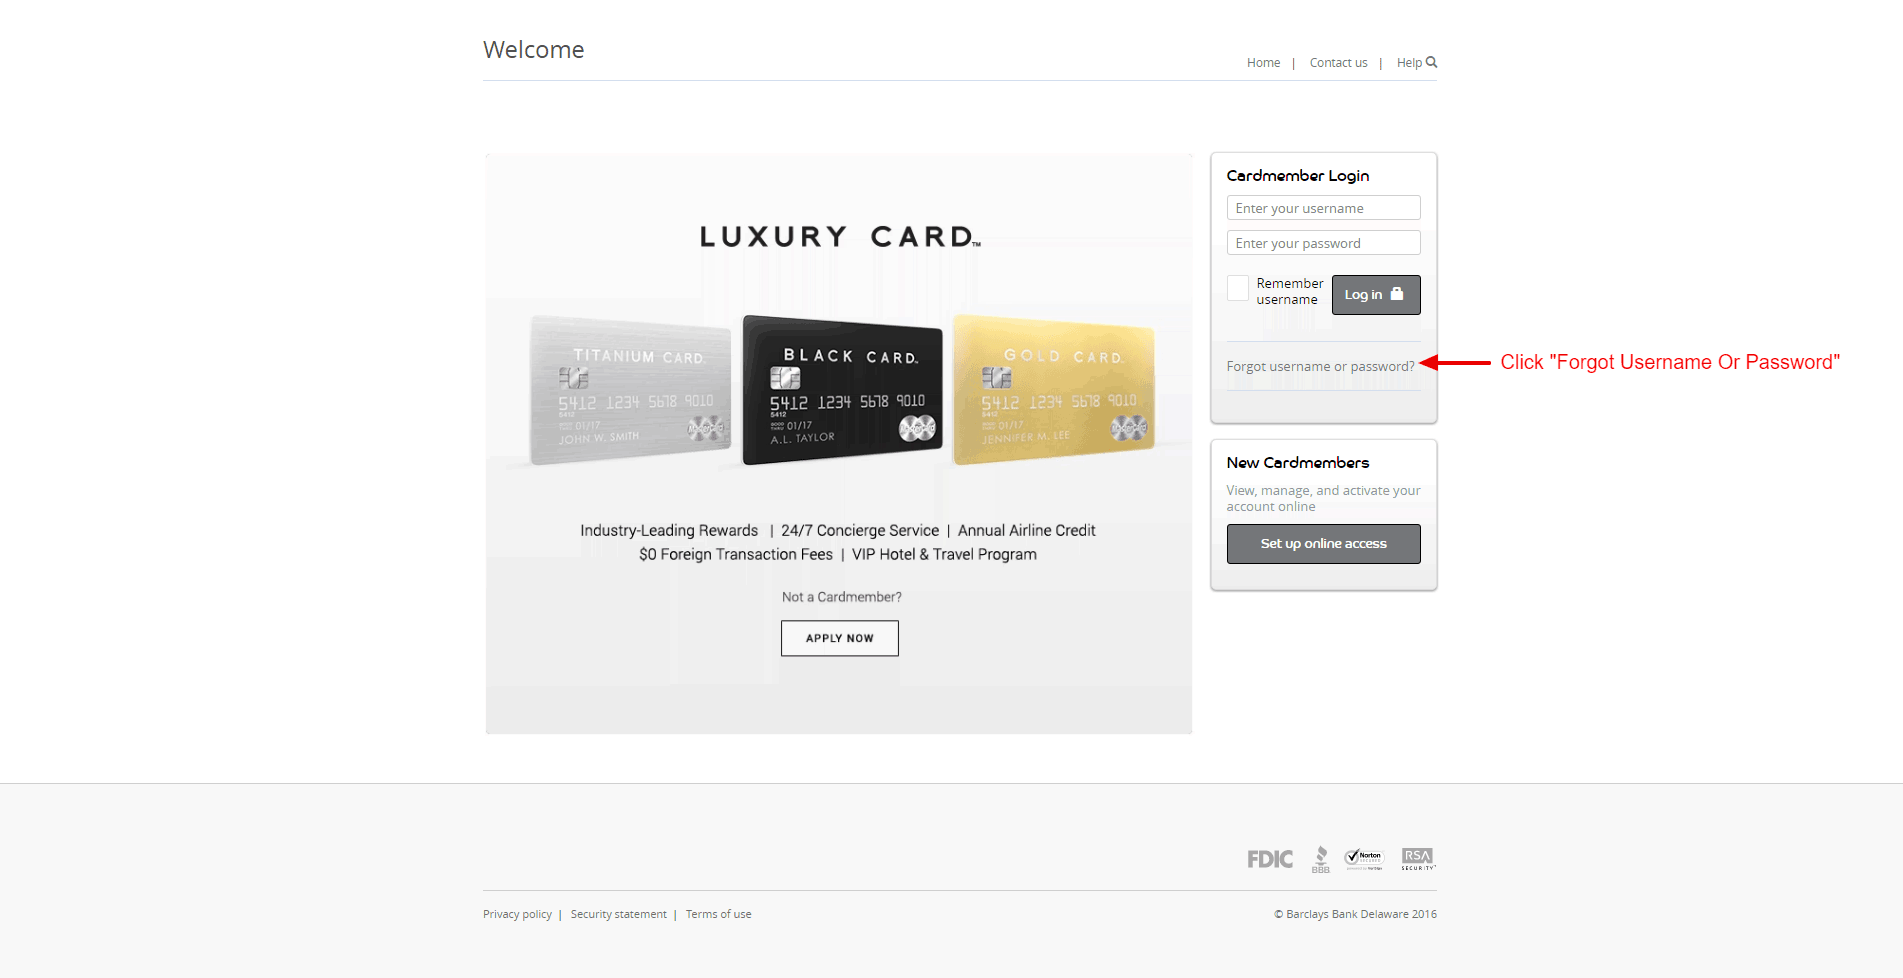 03_luxury-card_resetpassword_03